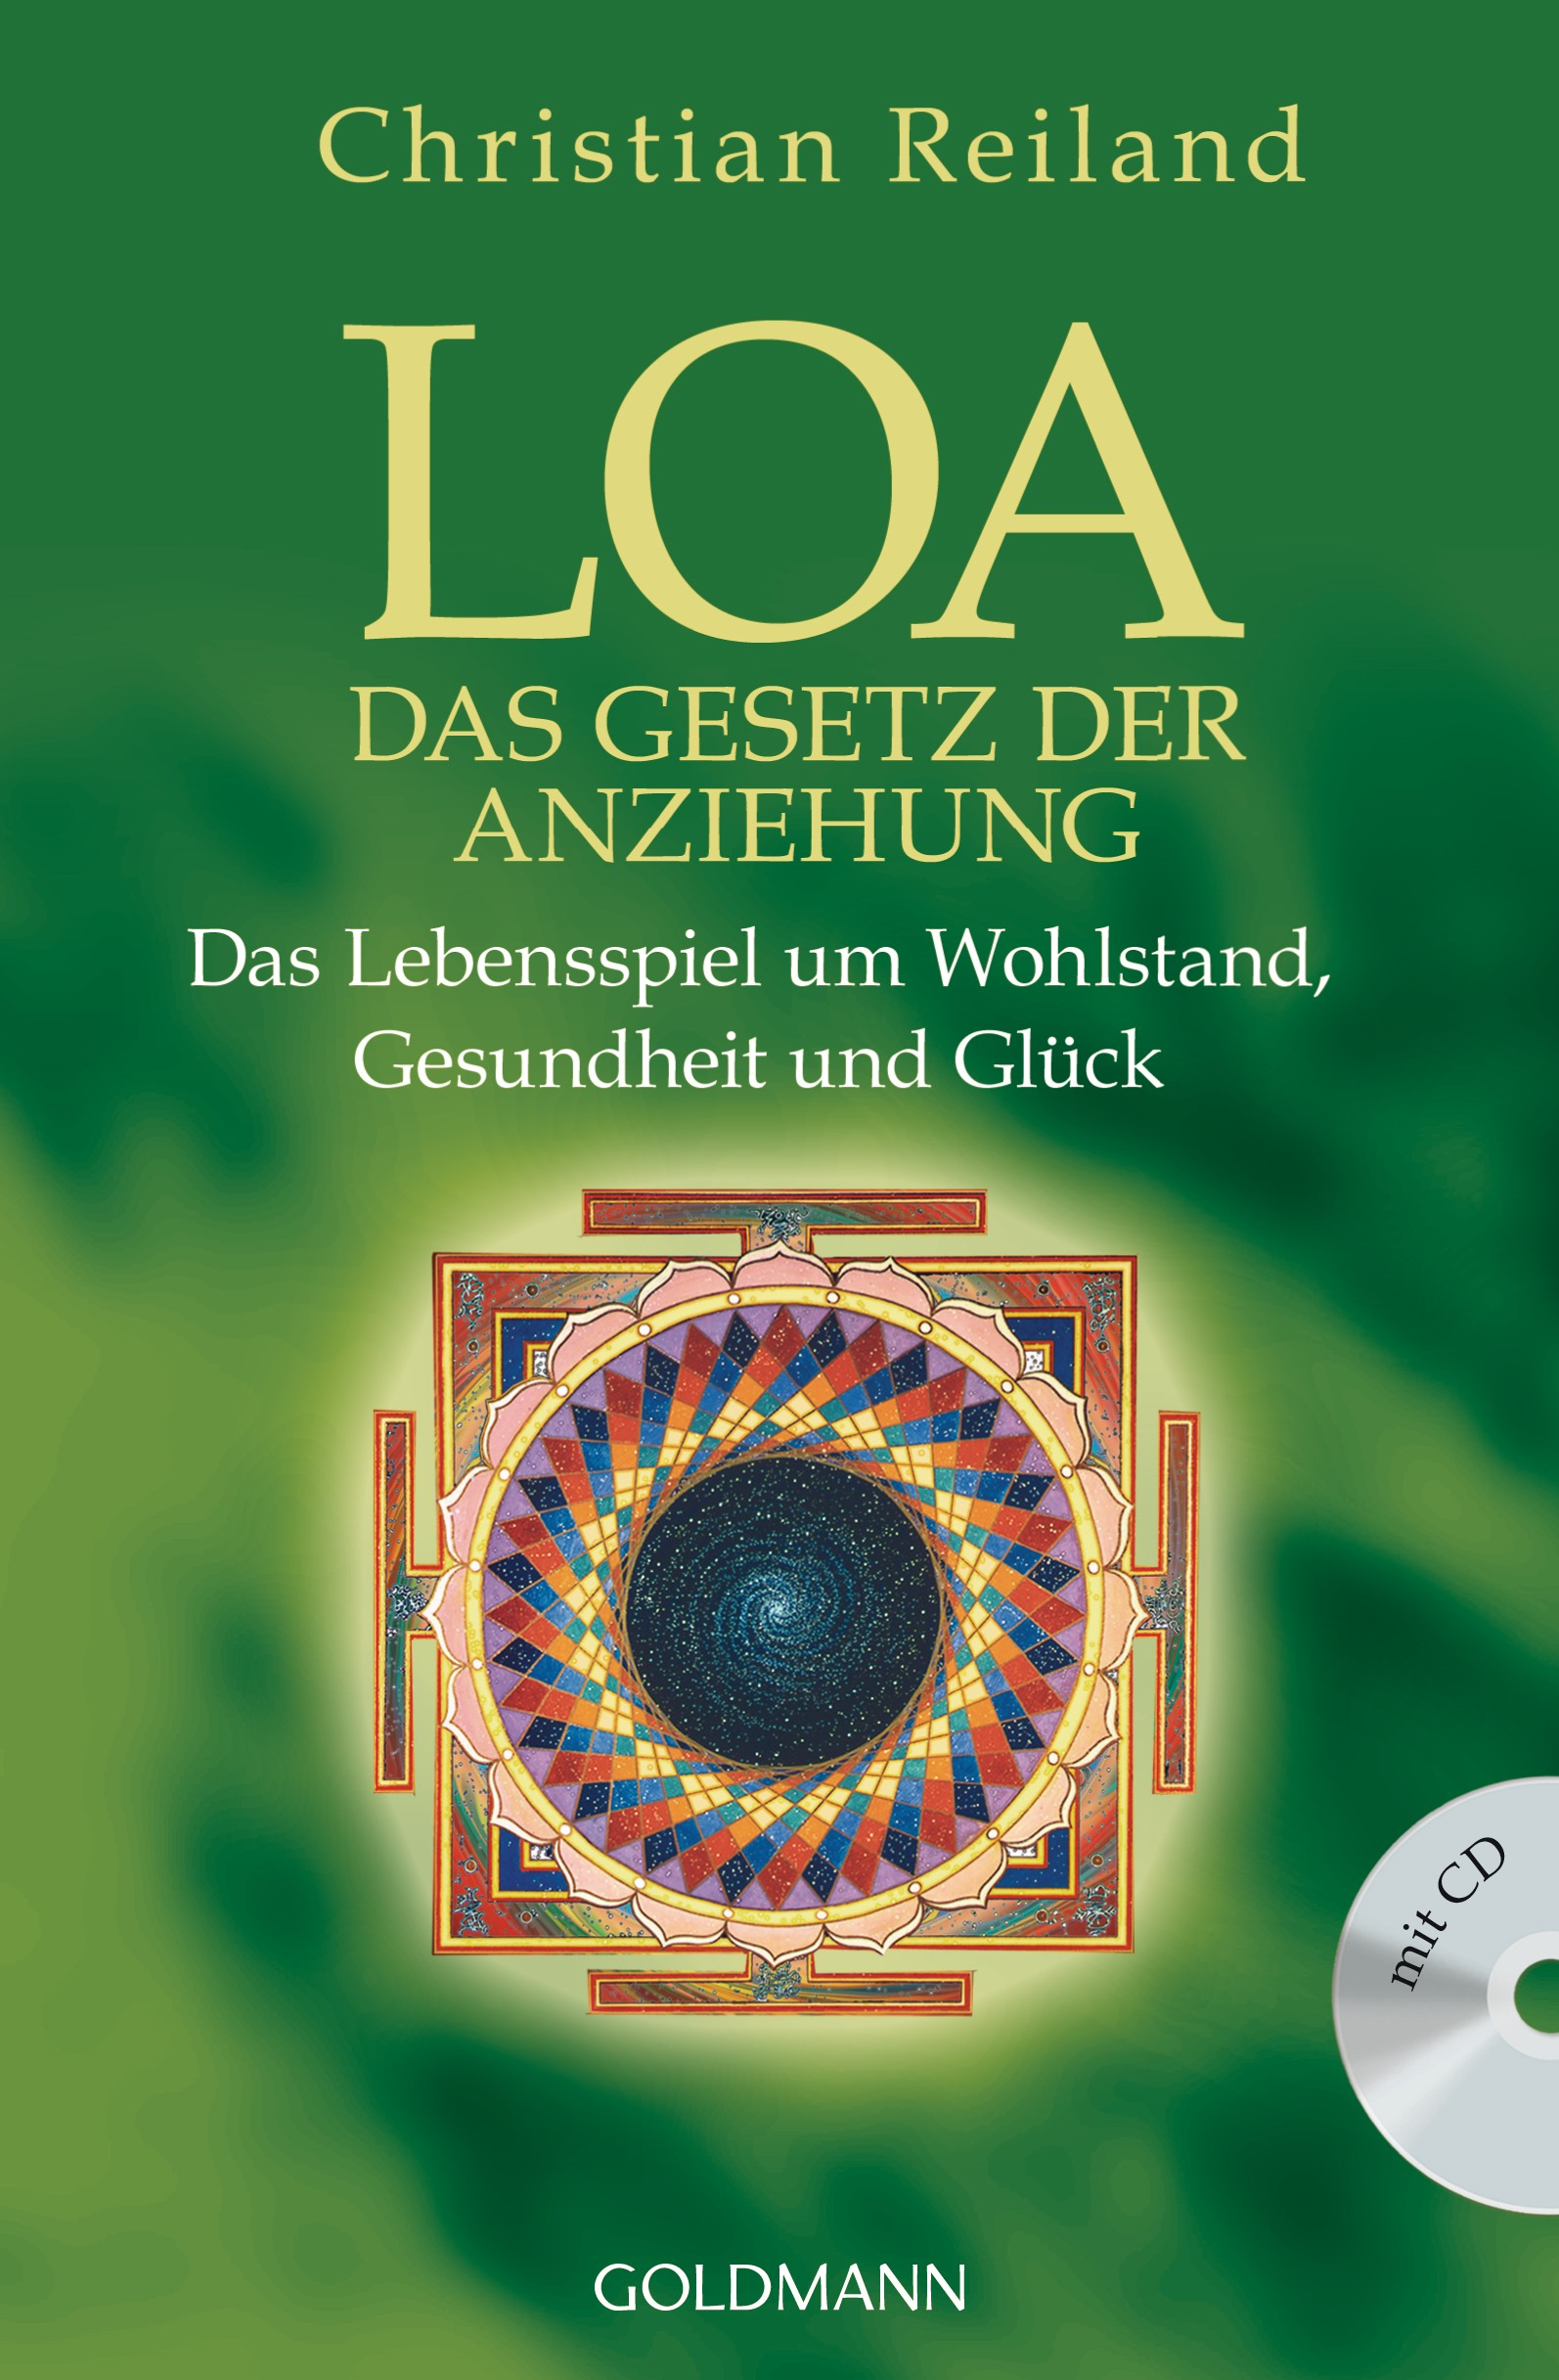 LOA: Das Gesetz der Anziehung - Das Lebensspiel...